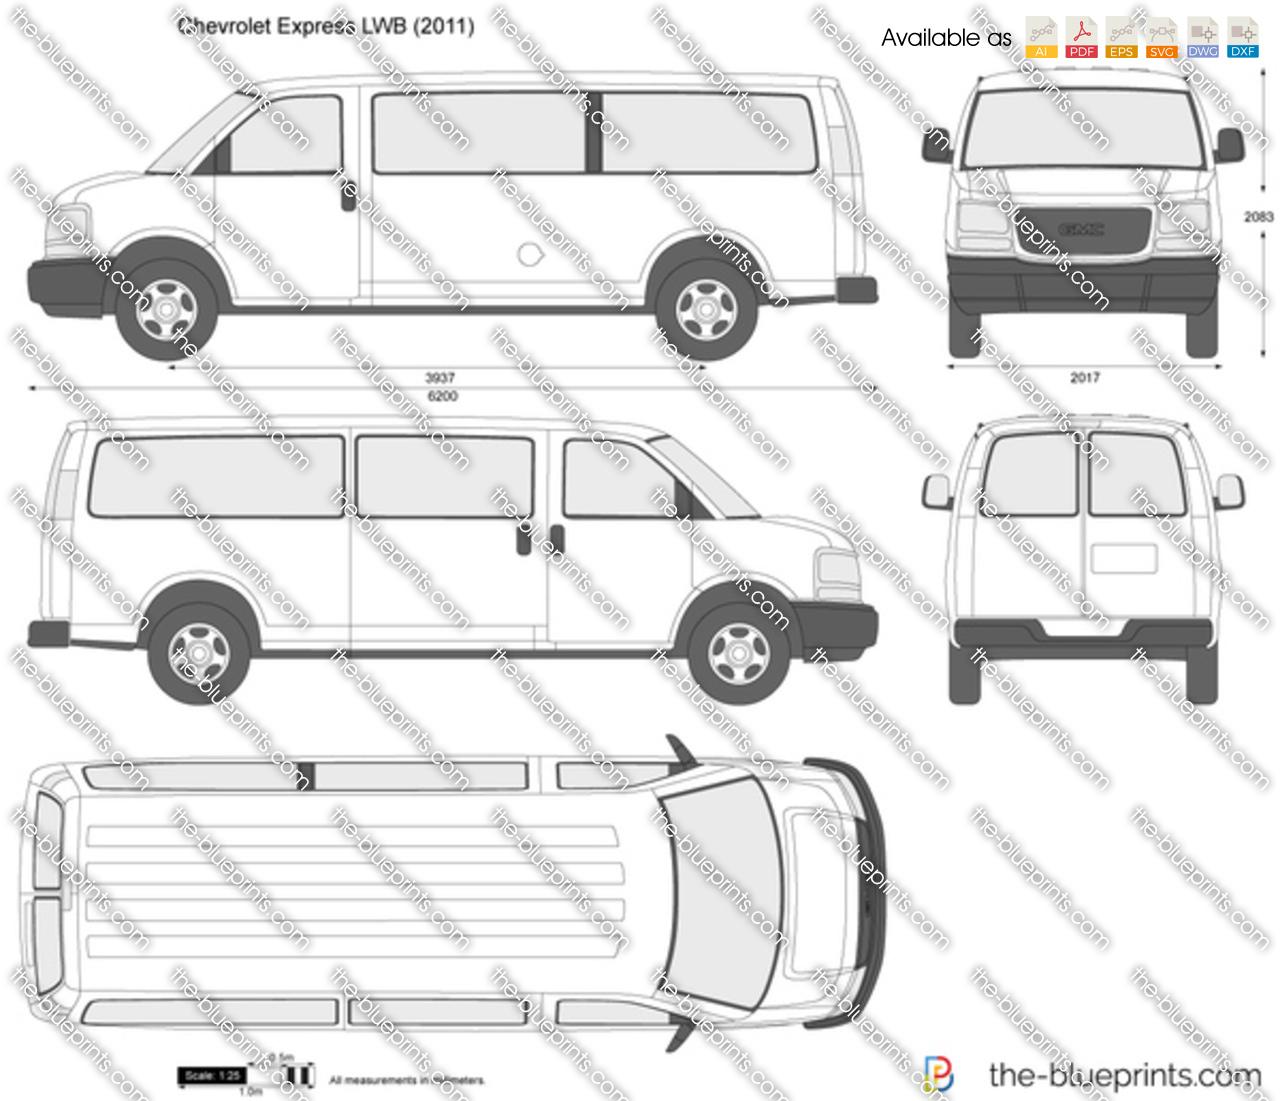 The blueprints com vector drawing chevrolet express lwb